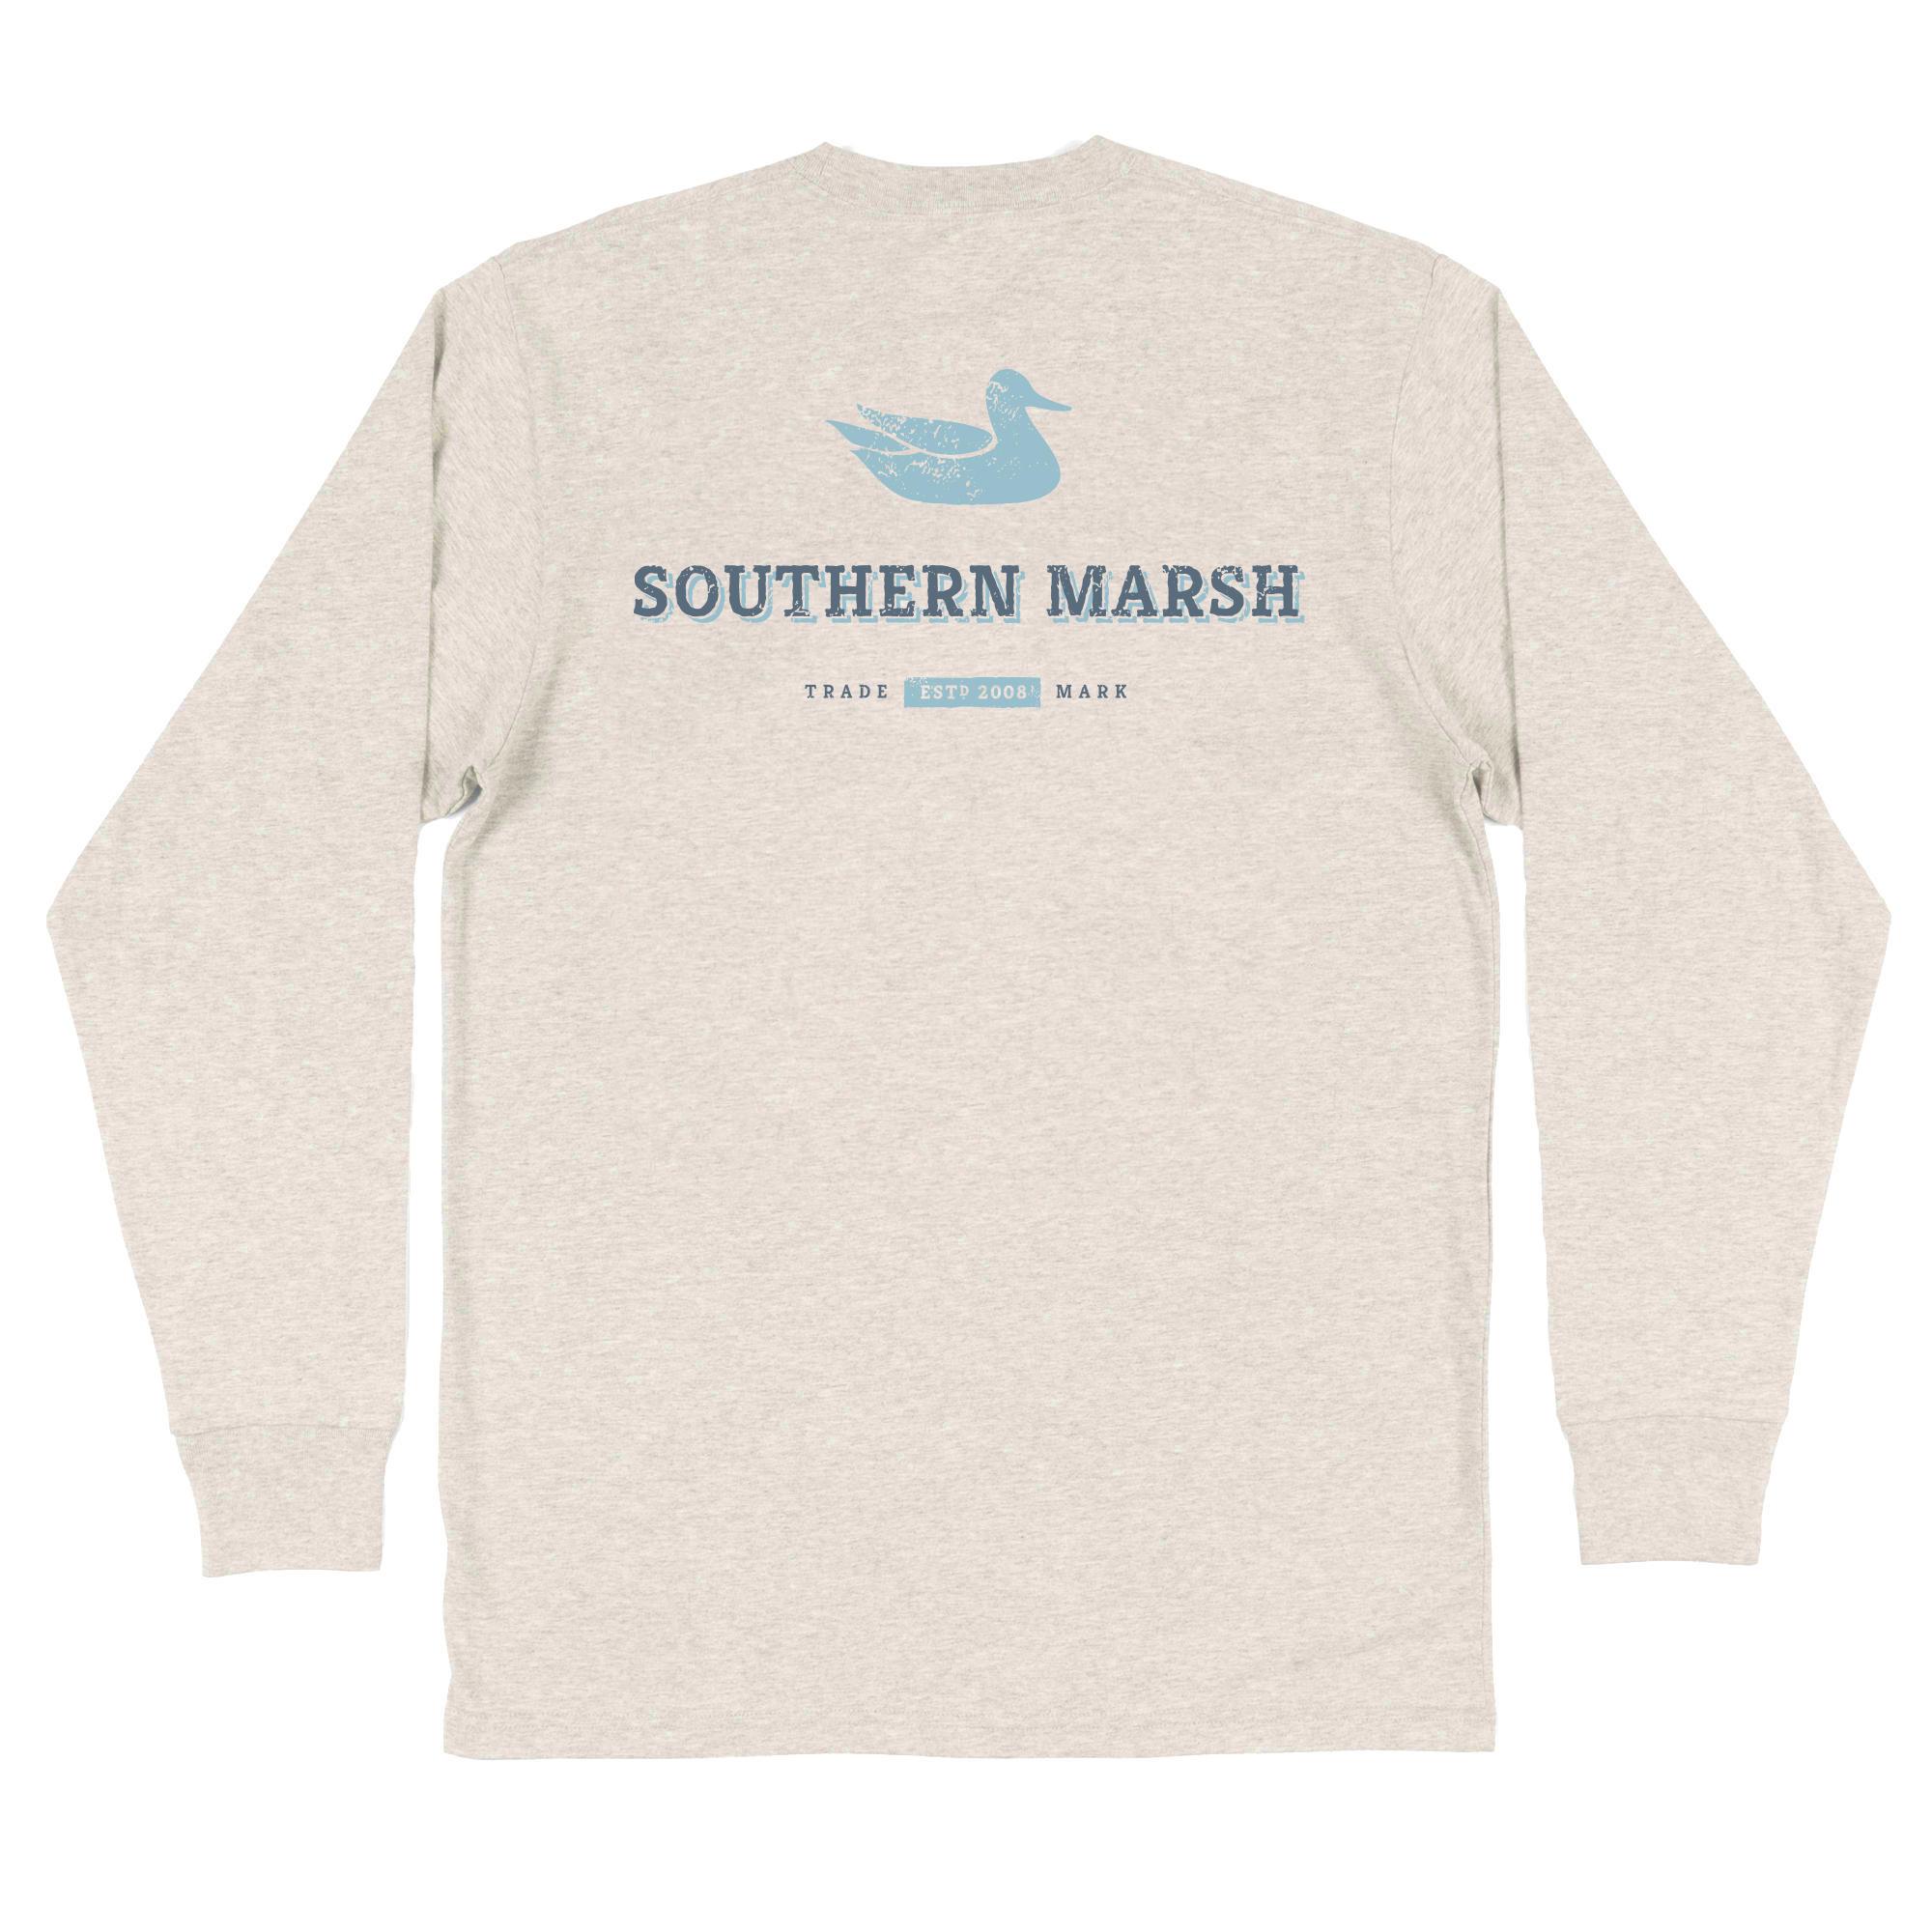 Southern Marsh Trademark Duck Tee - Long Sleeve